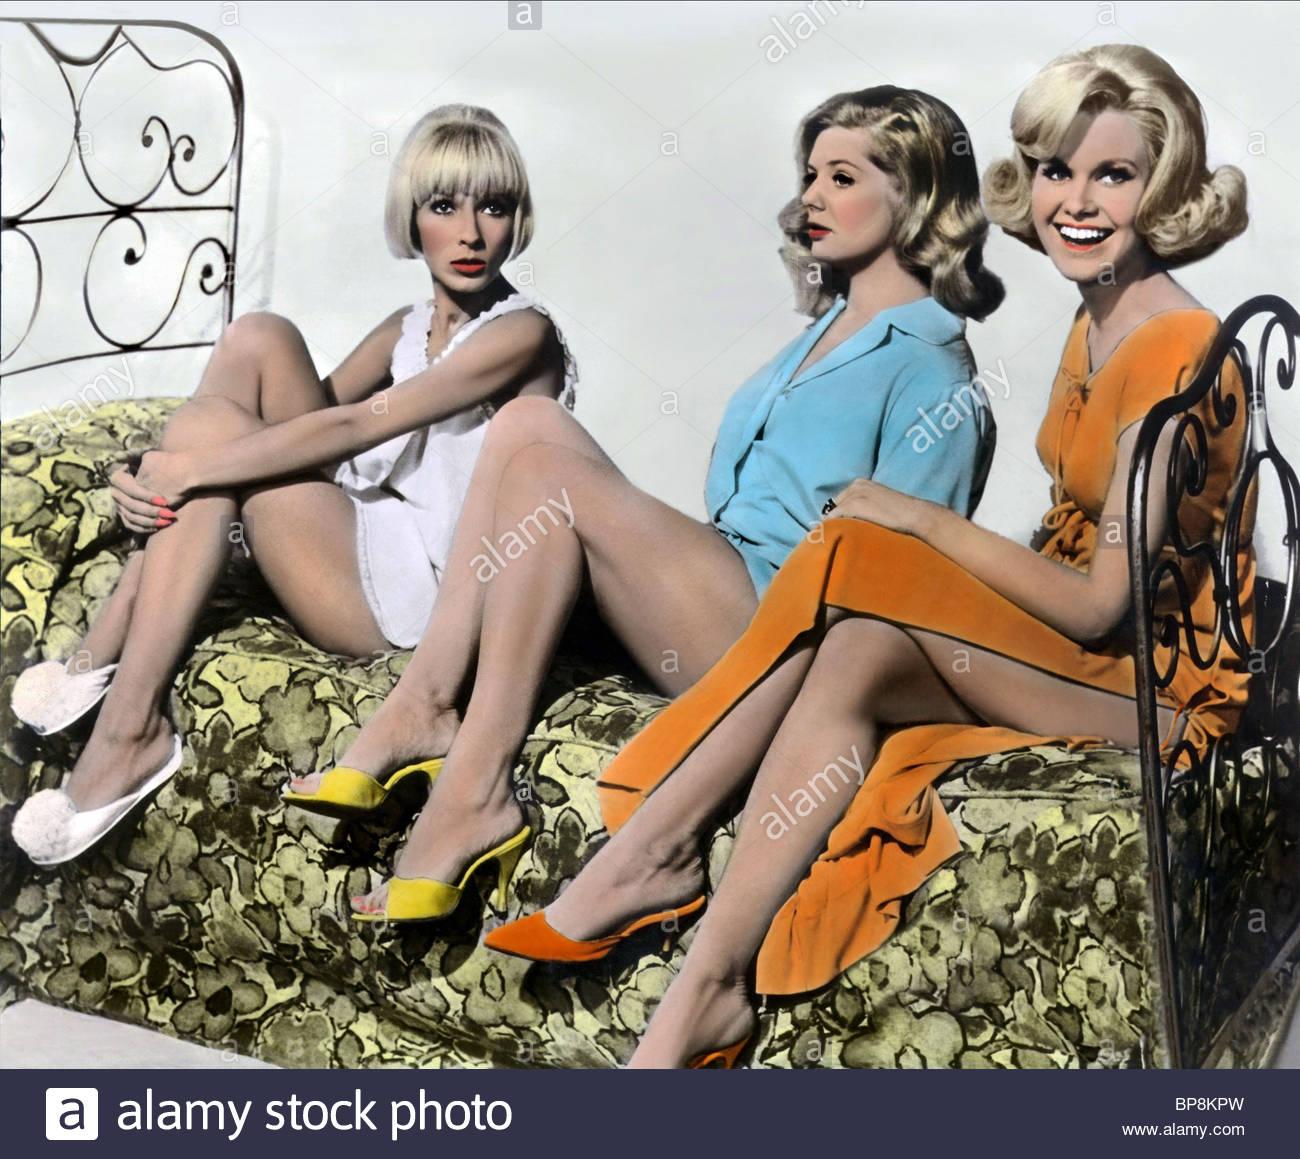 boeing boeing 1965 ok.ru